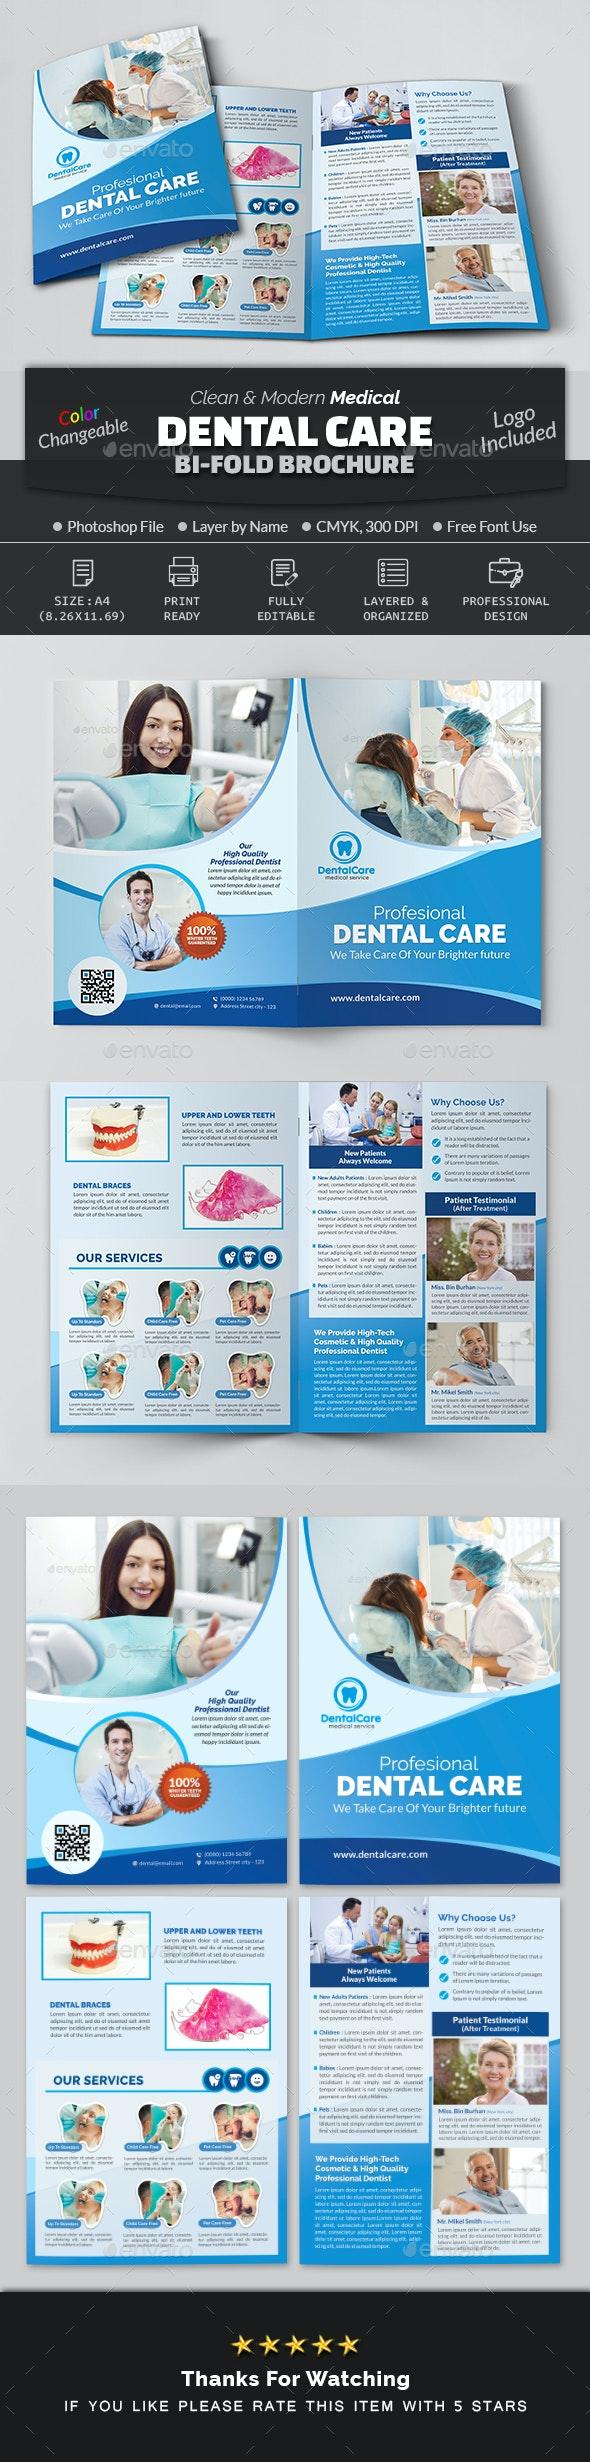 Dental Bi Fold Brochure - Corporate Brochures